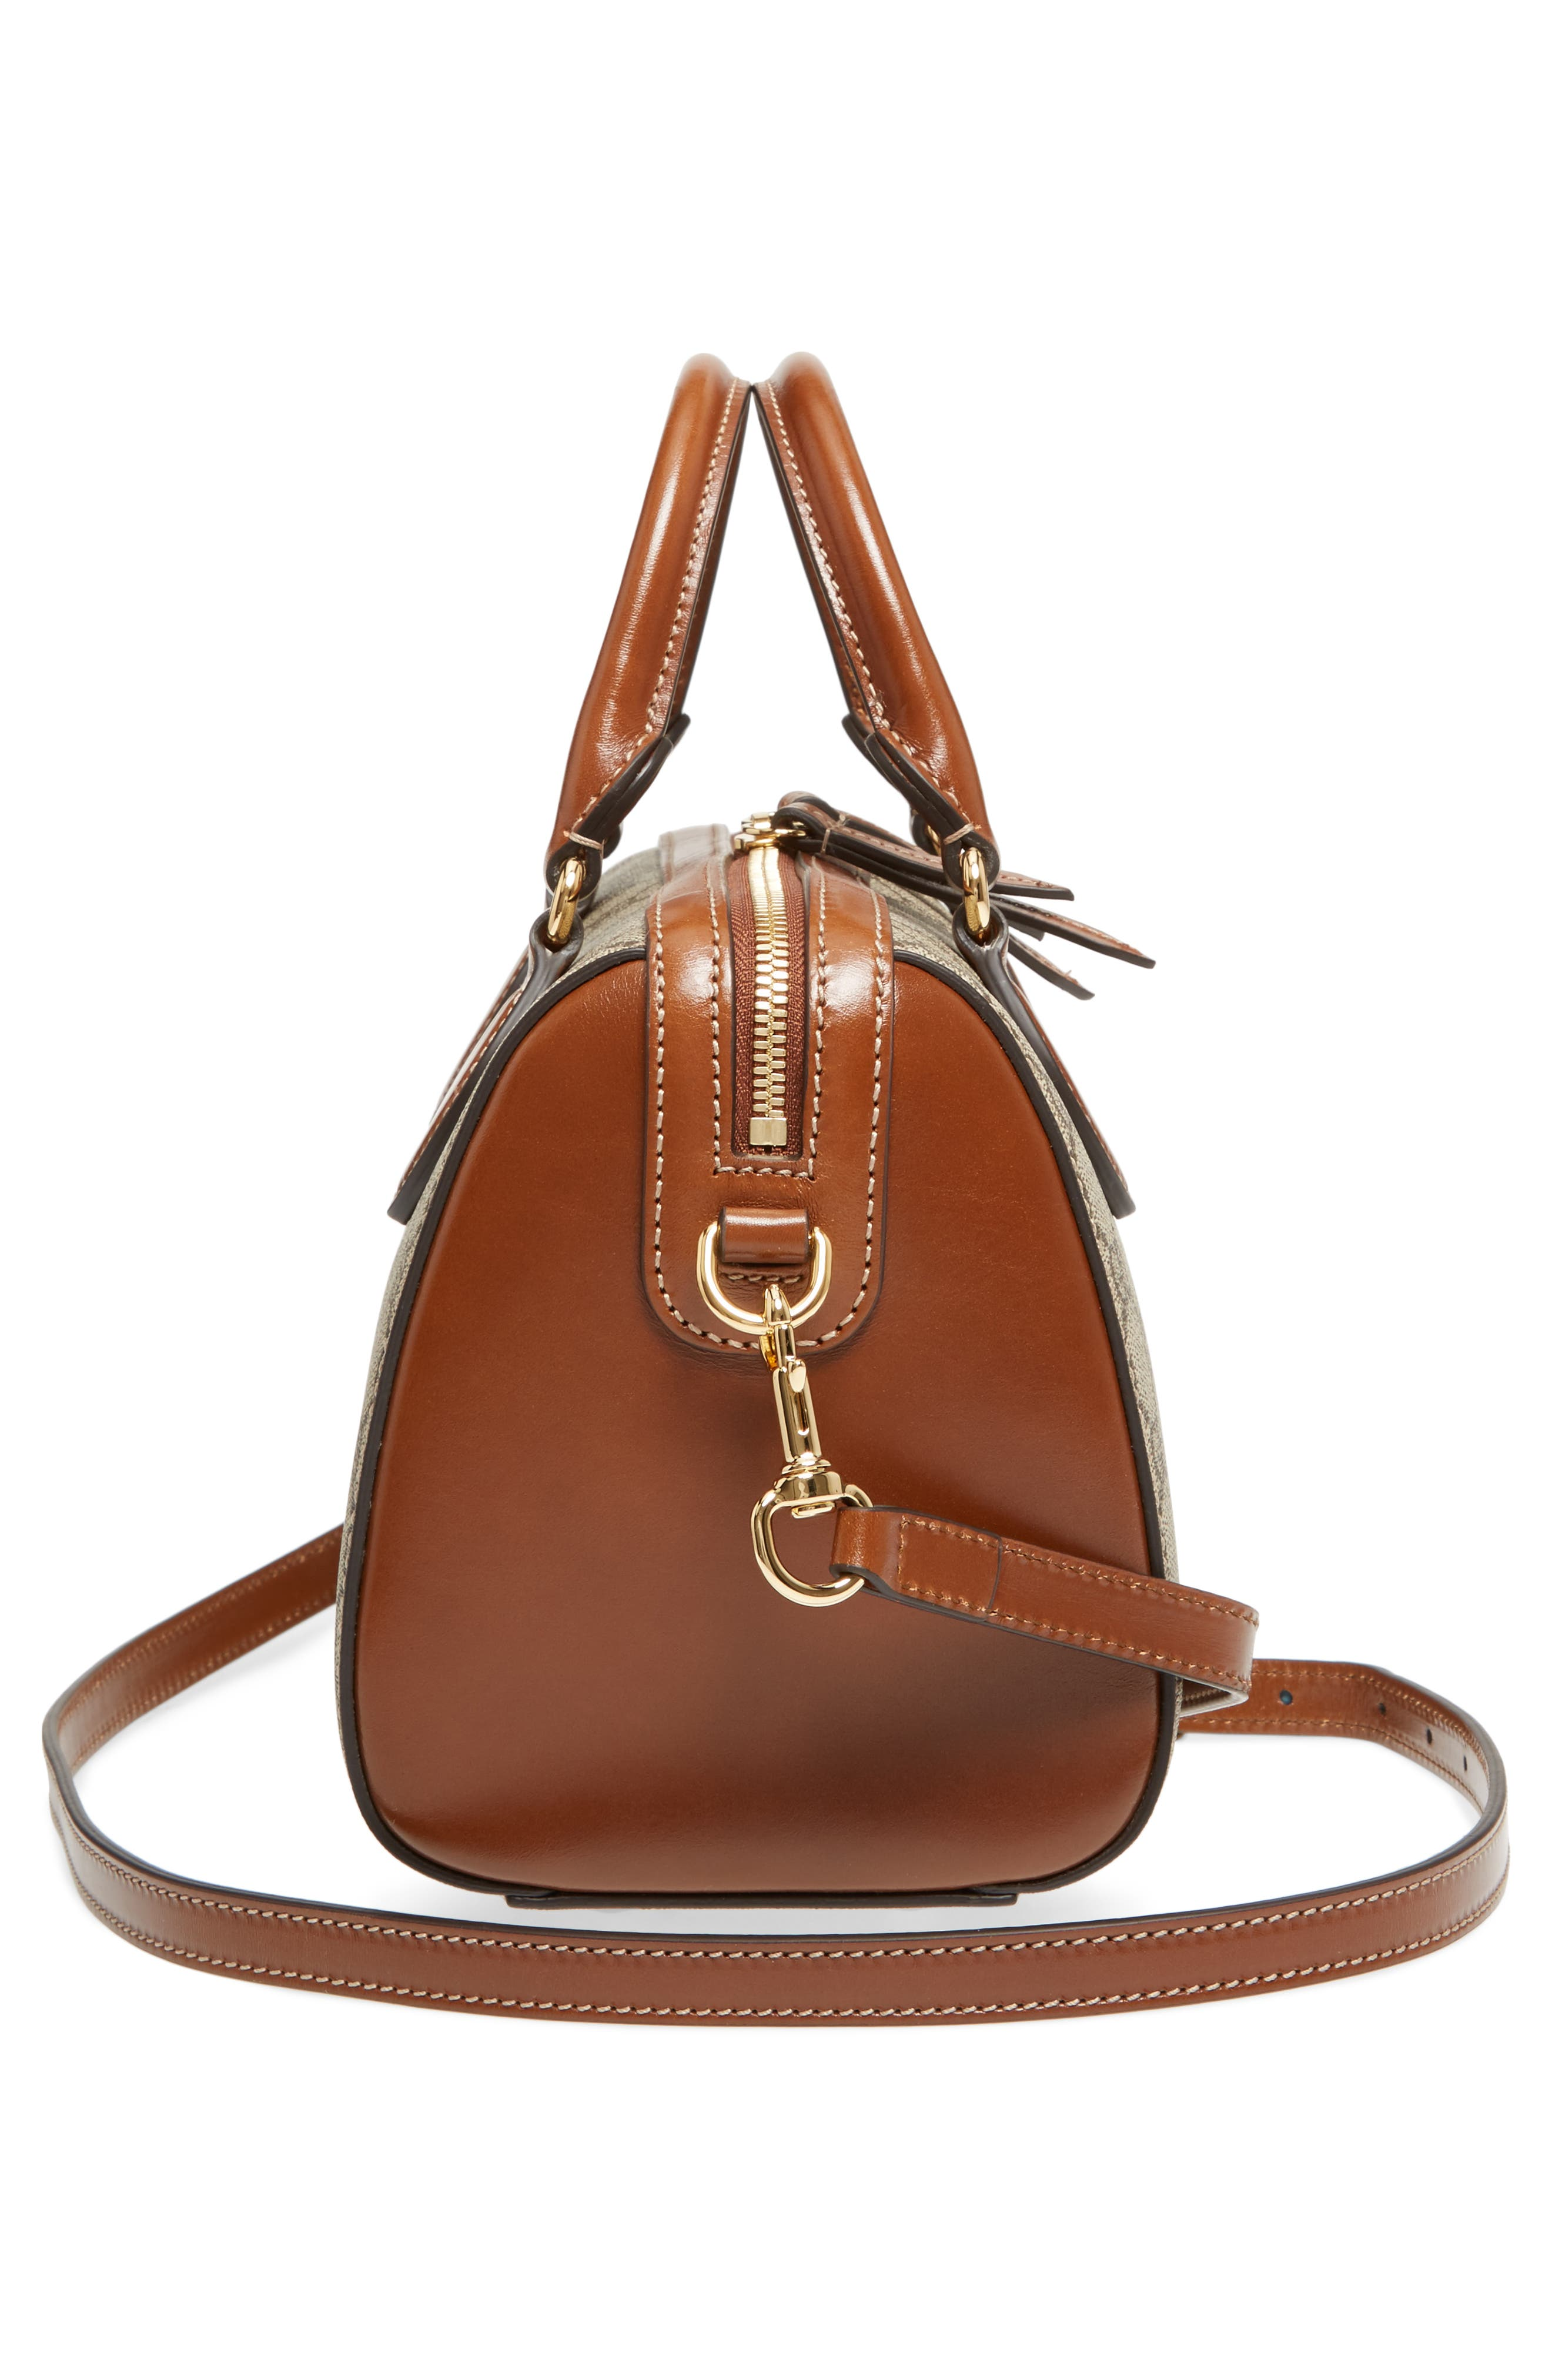 Linea Top Handle GG Supreme Canvas & Leather Bag,                             Alternate thumbnail 5, color,                             Beige/ Ebony/ Cuir